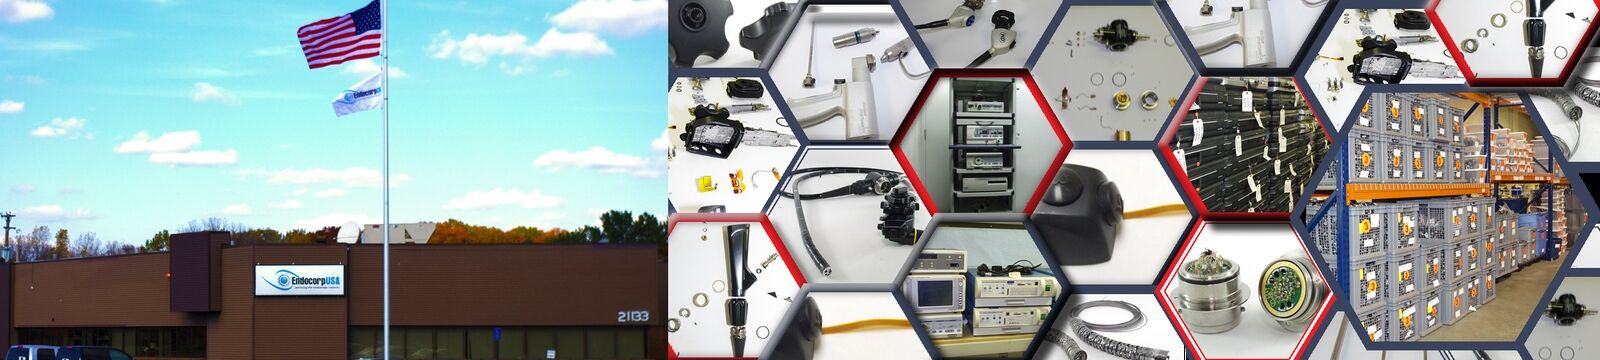 EndocorpUSA OEM Endoscopy Parts